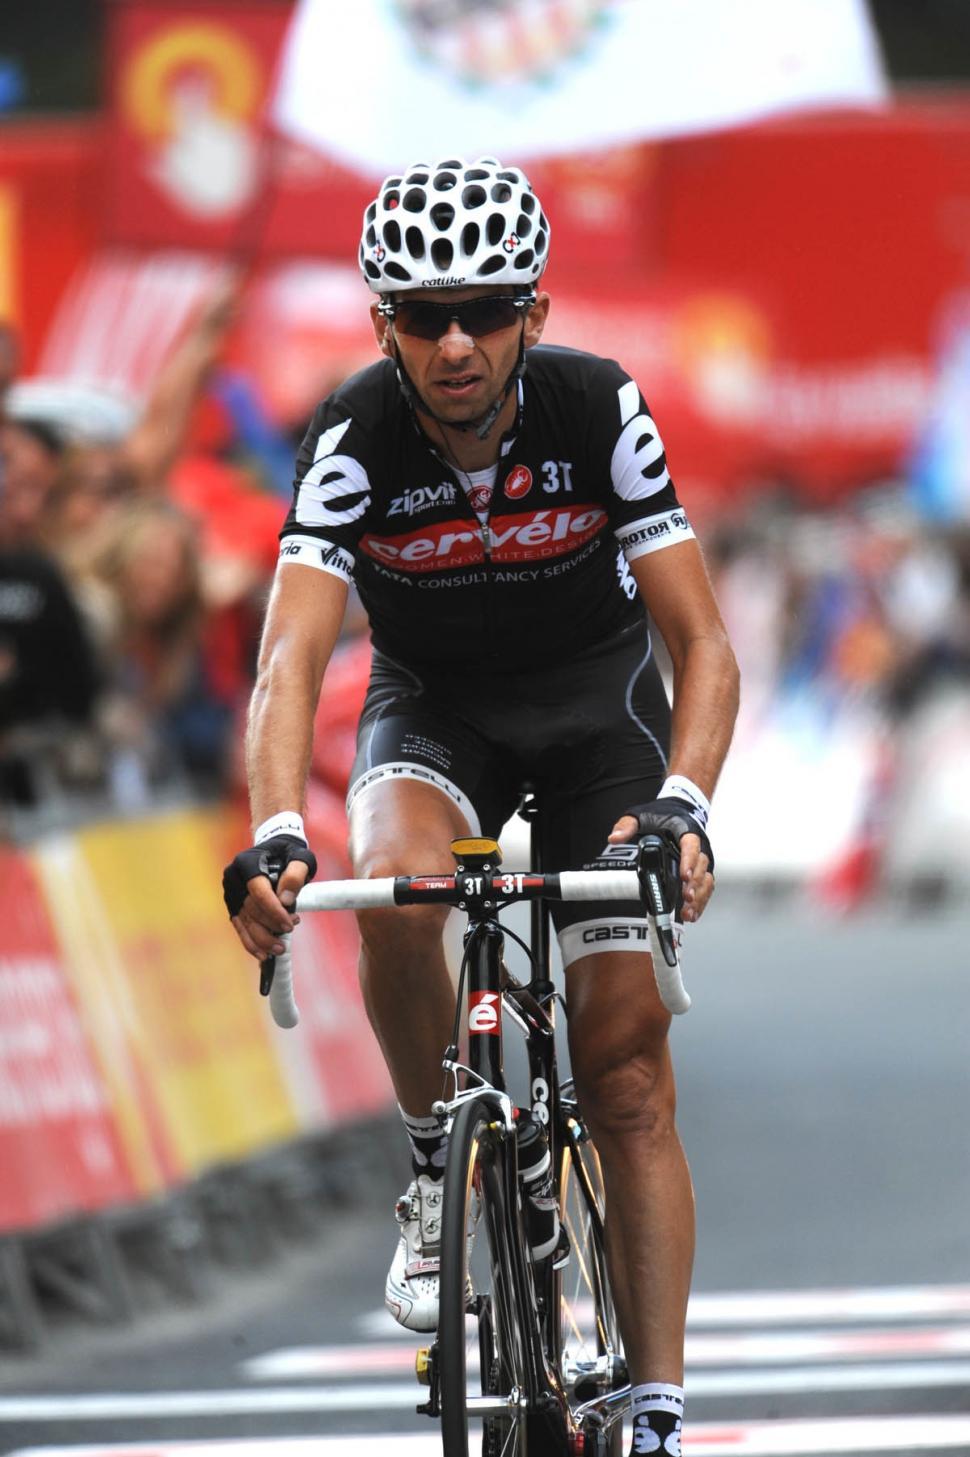 Xavier Tondo takes 3rd in Stage 11 of the 2010 Vuelta (copyright Unipublic:Graham Watson)